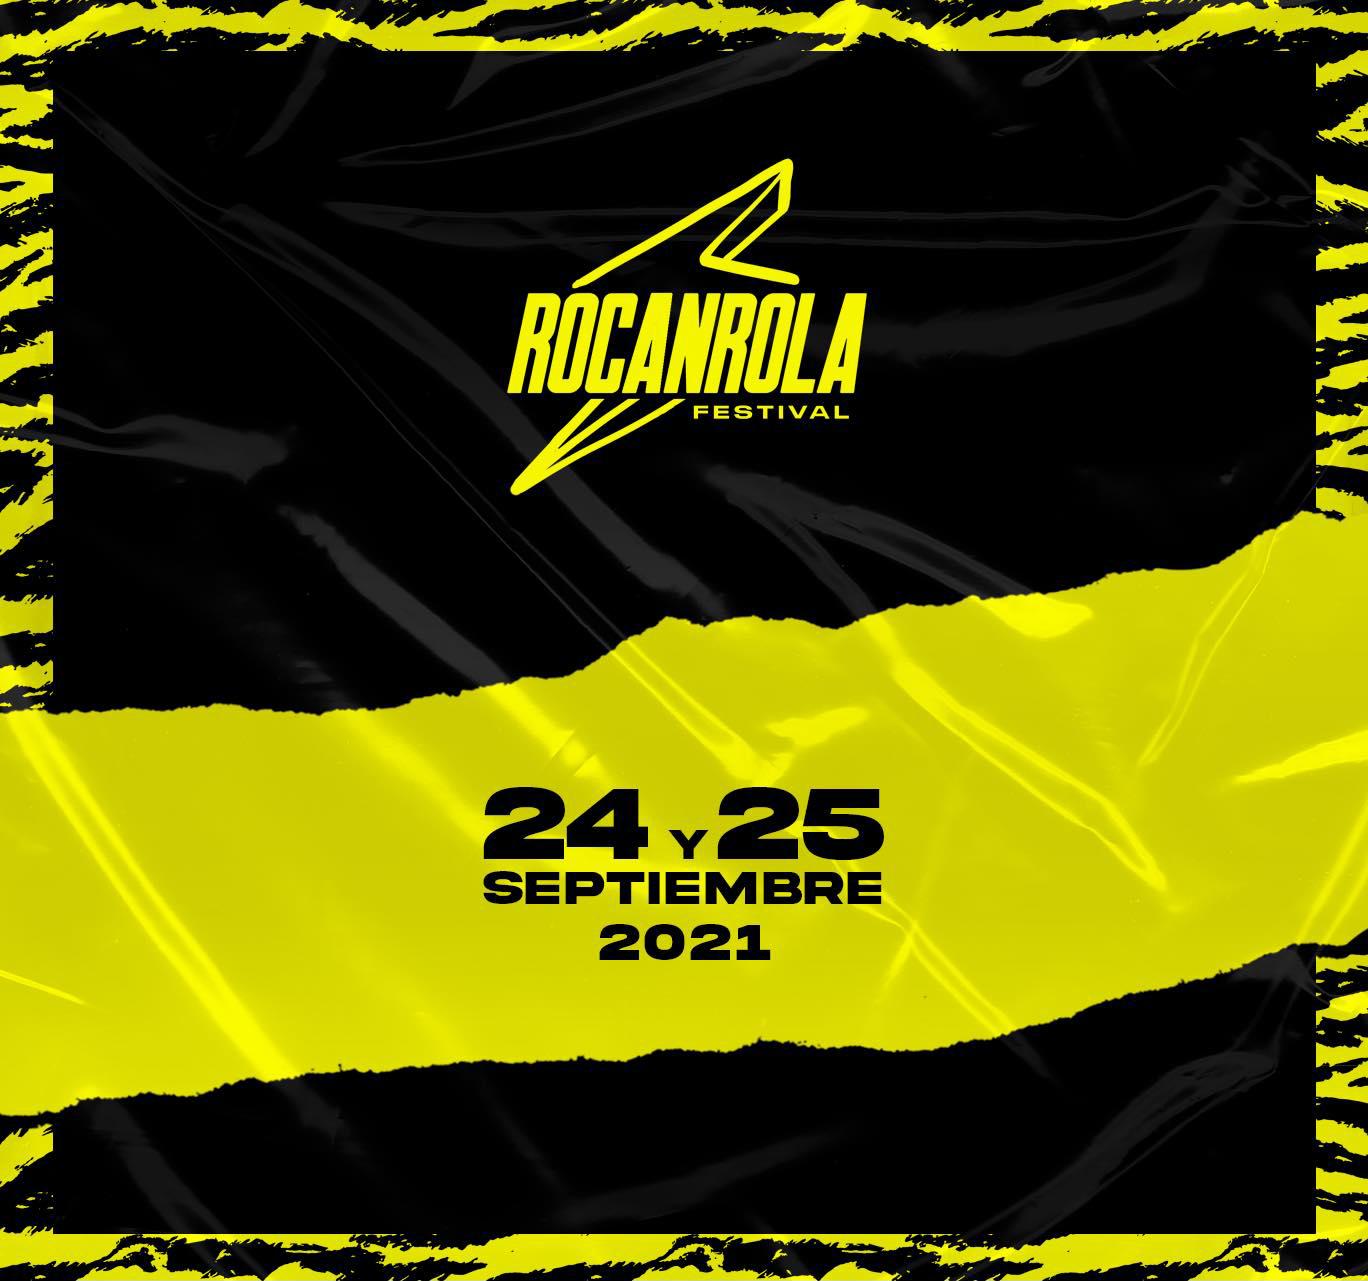 festival-rocanrola-5f73021452237.png